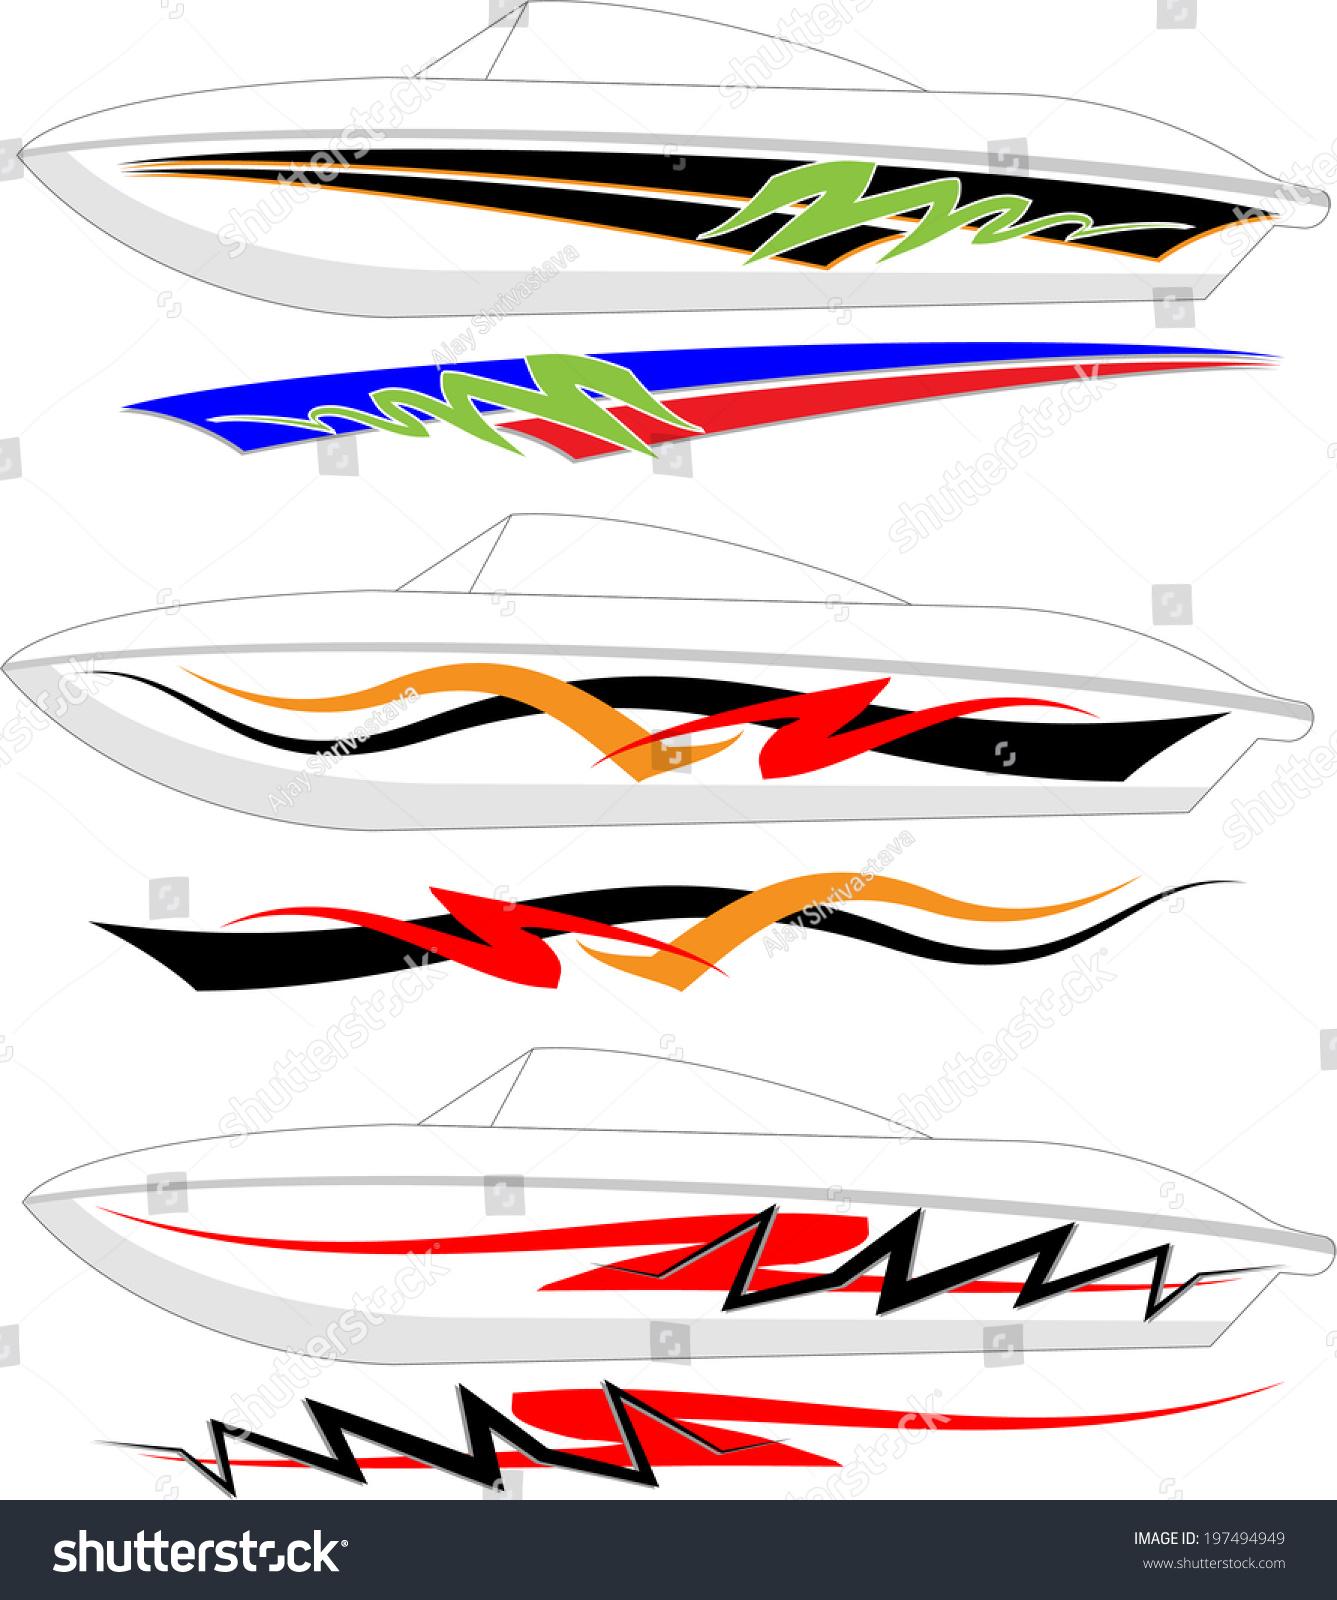 boat graphics stripe vinyl ready